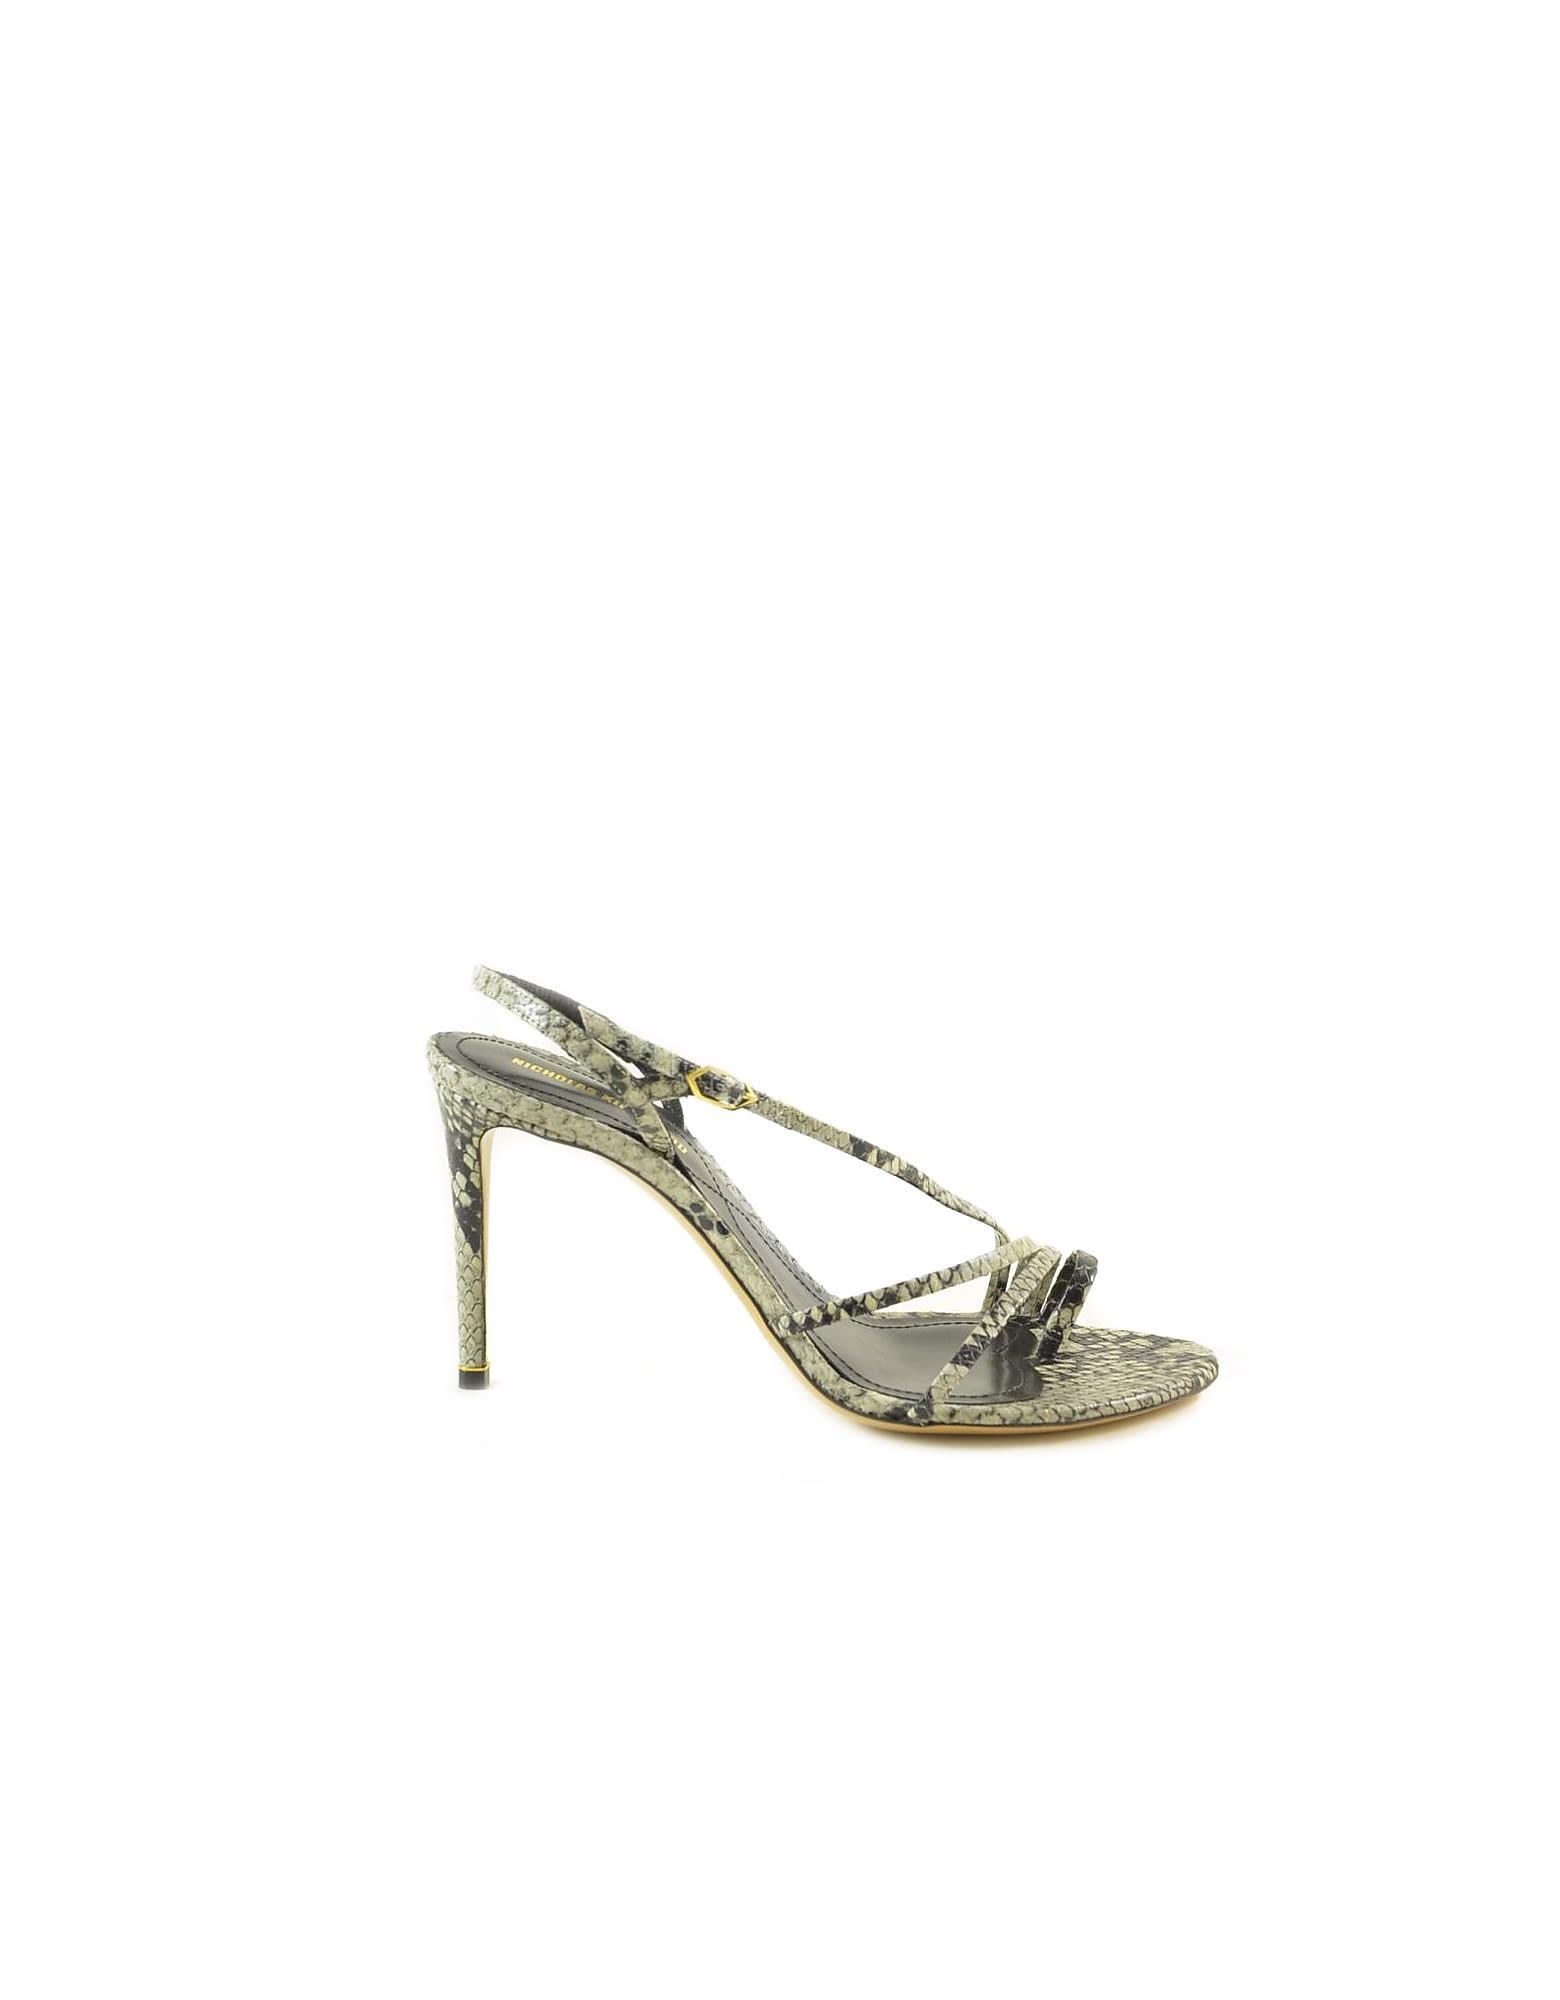 Buy Nicholas Kirkwood Snake Print Leather High Heel Sandals online, shop Nicholas Kirkwood shoes with free shipping